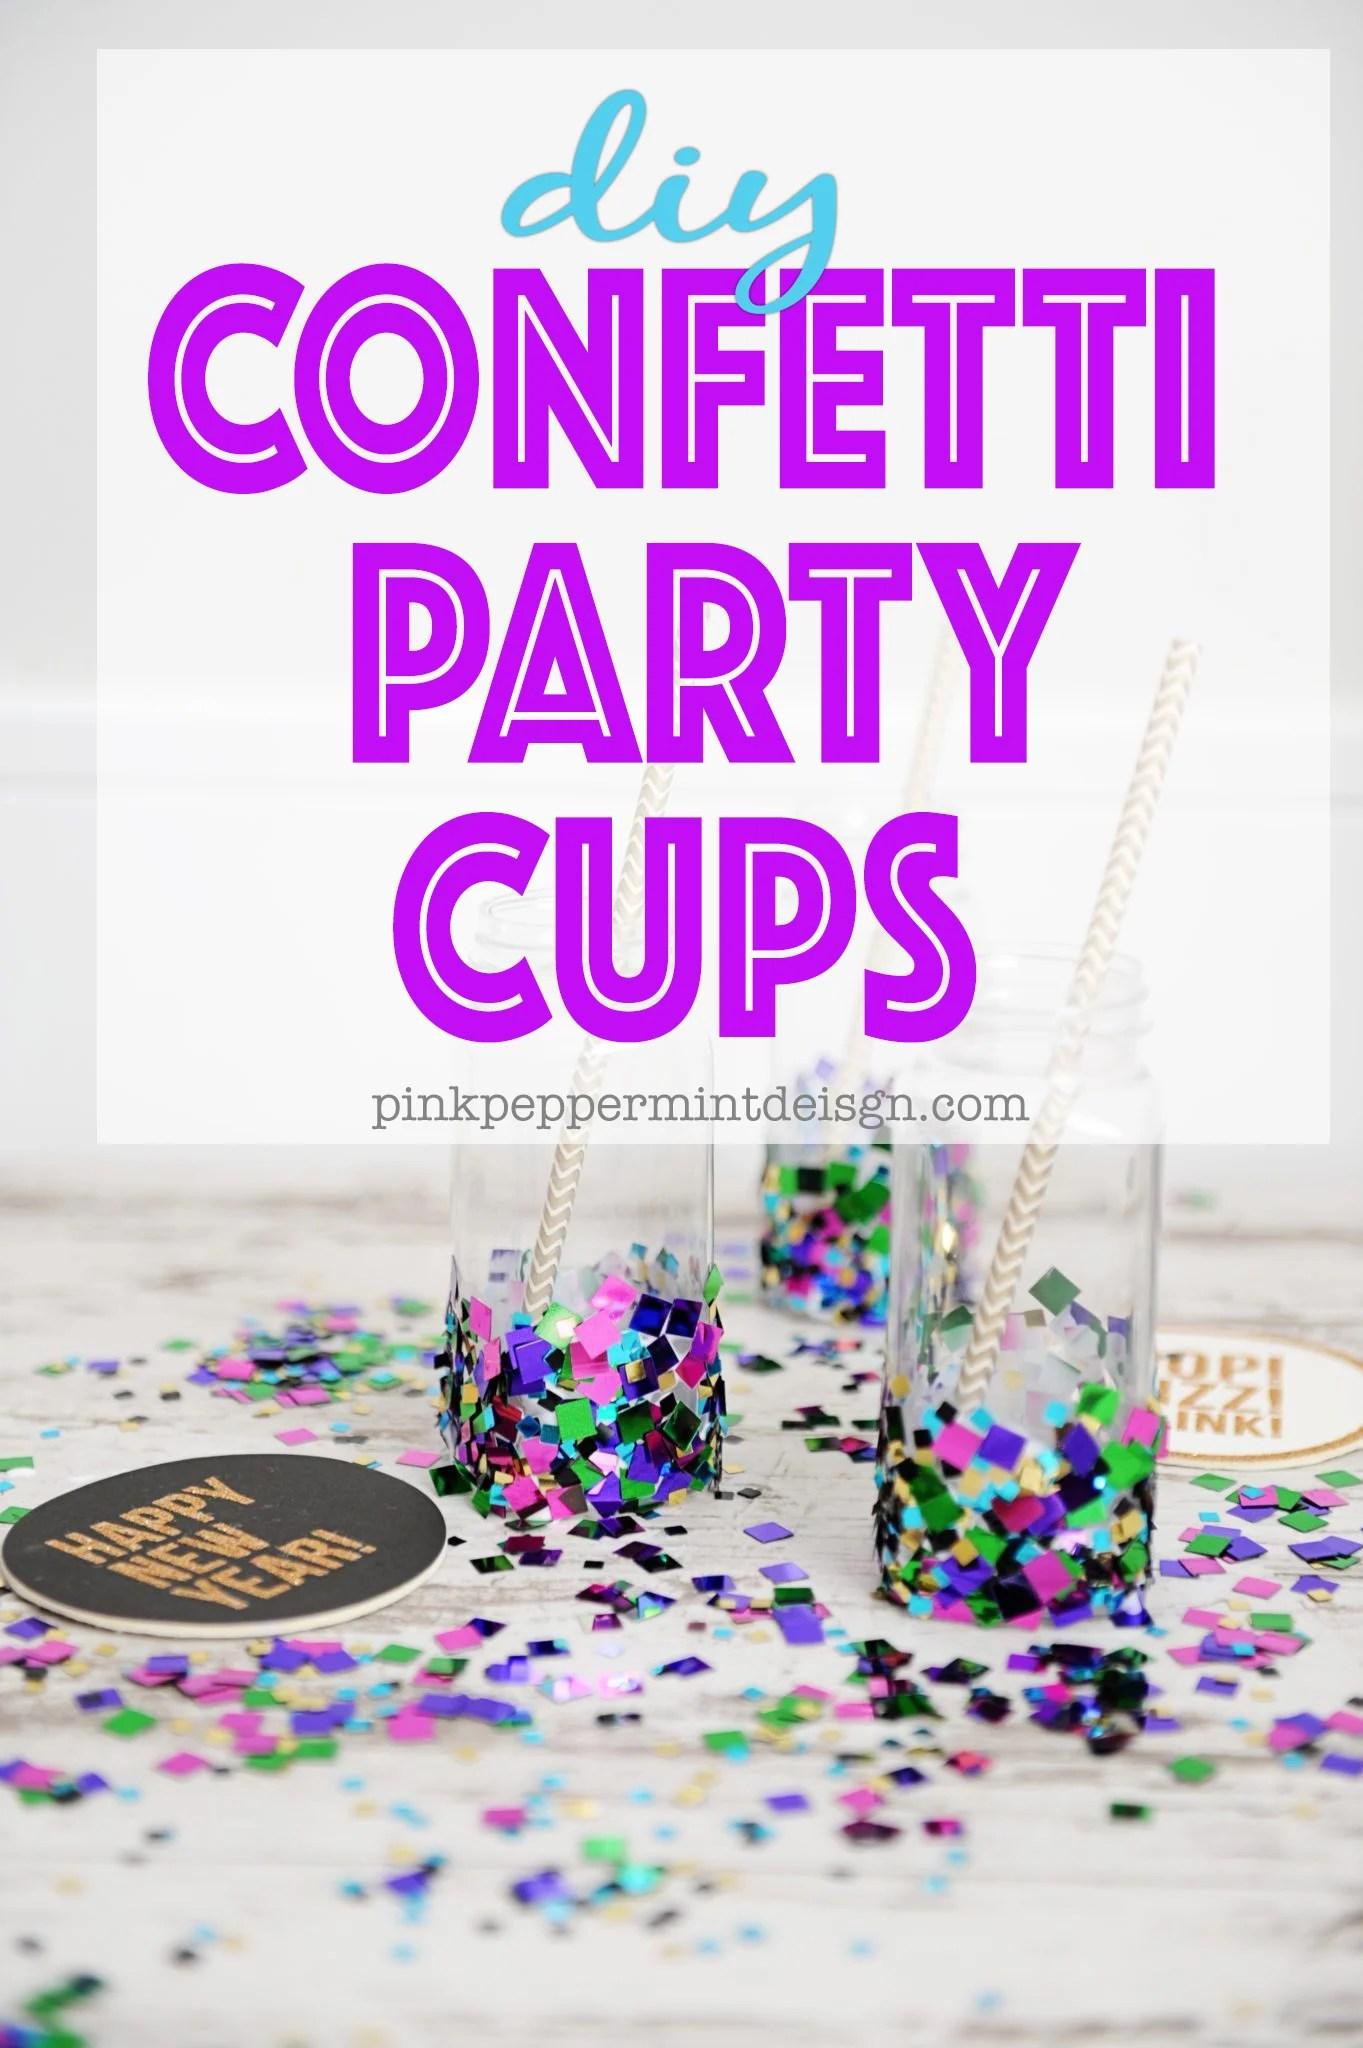 DIY Party Decorations : Confetti Cups